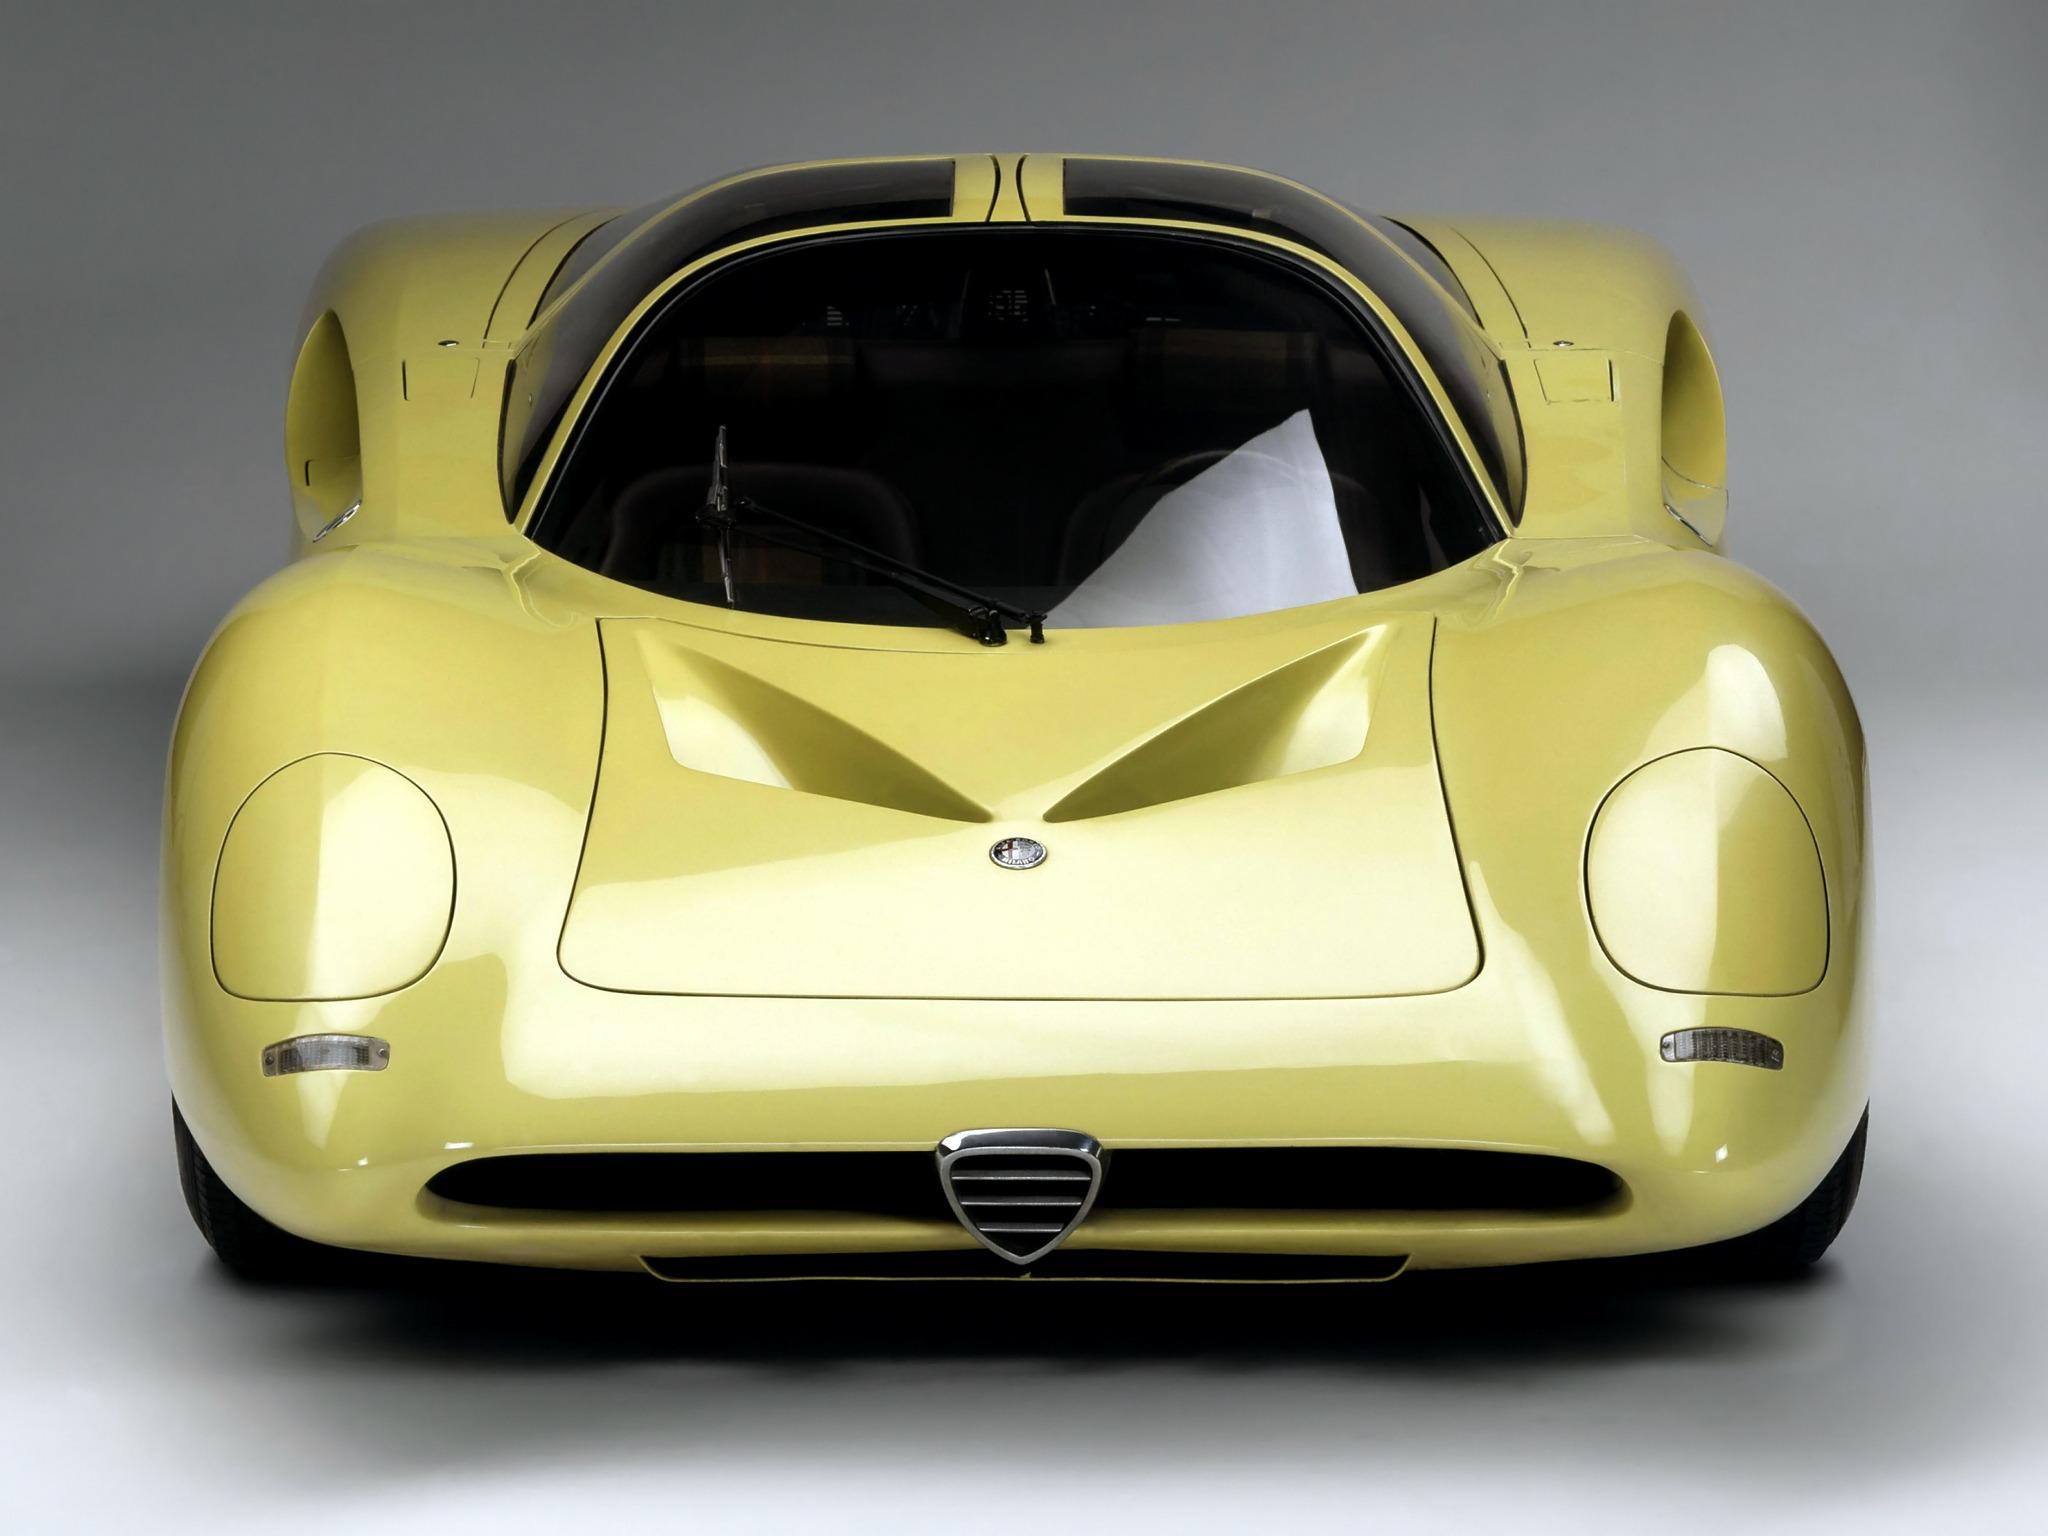 Alfa Romeo Tipo 33 2 Coupe Speciale 1969 Old Concept Cars